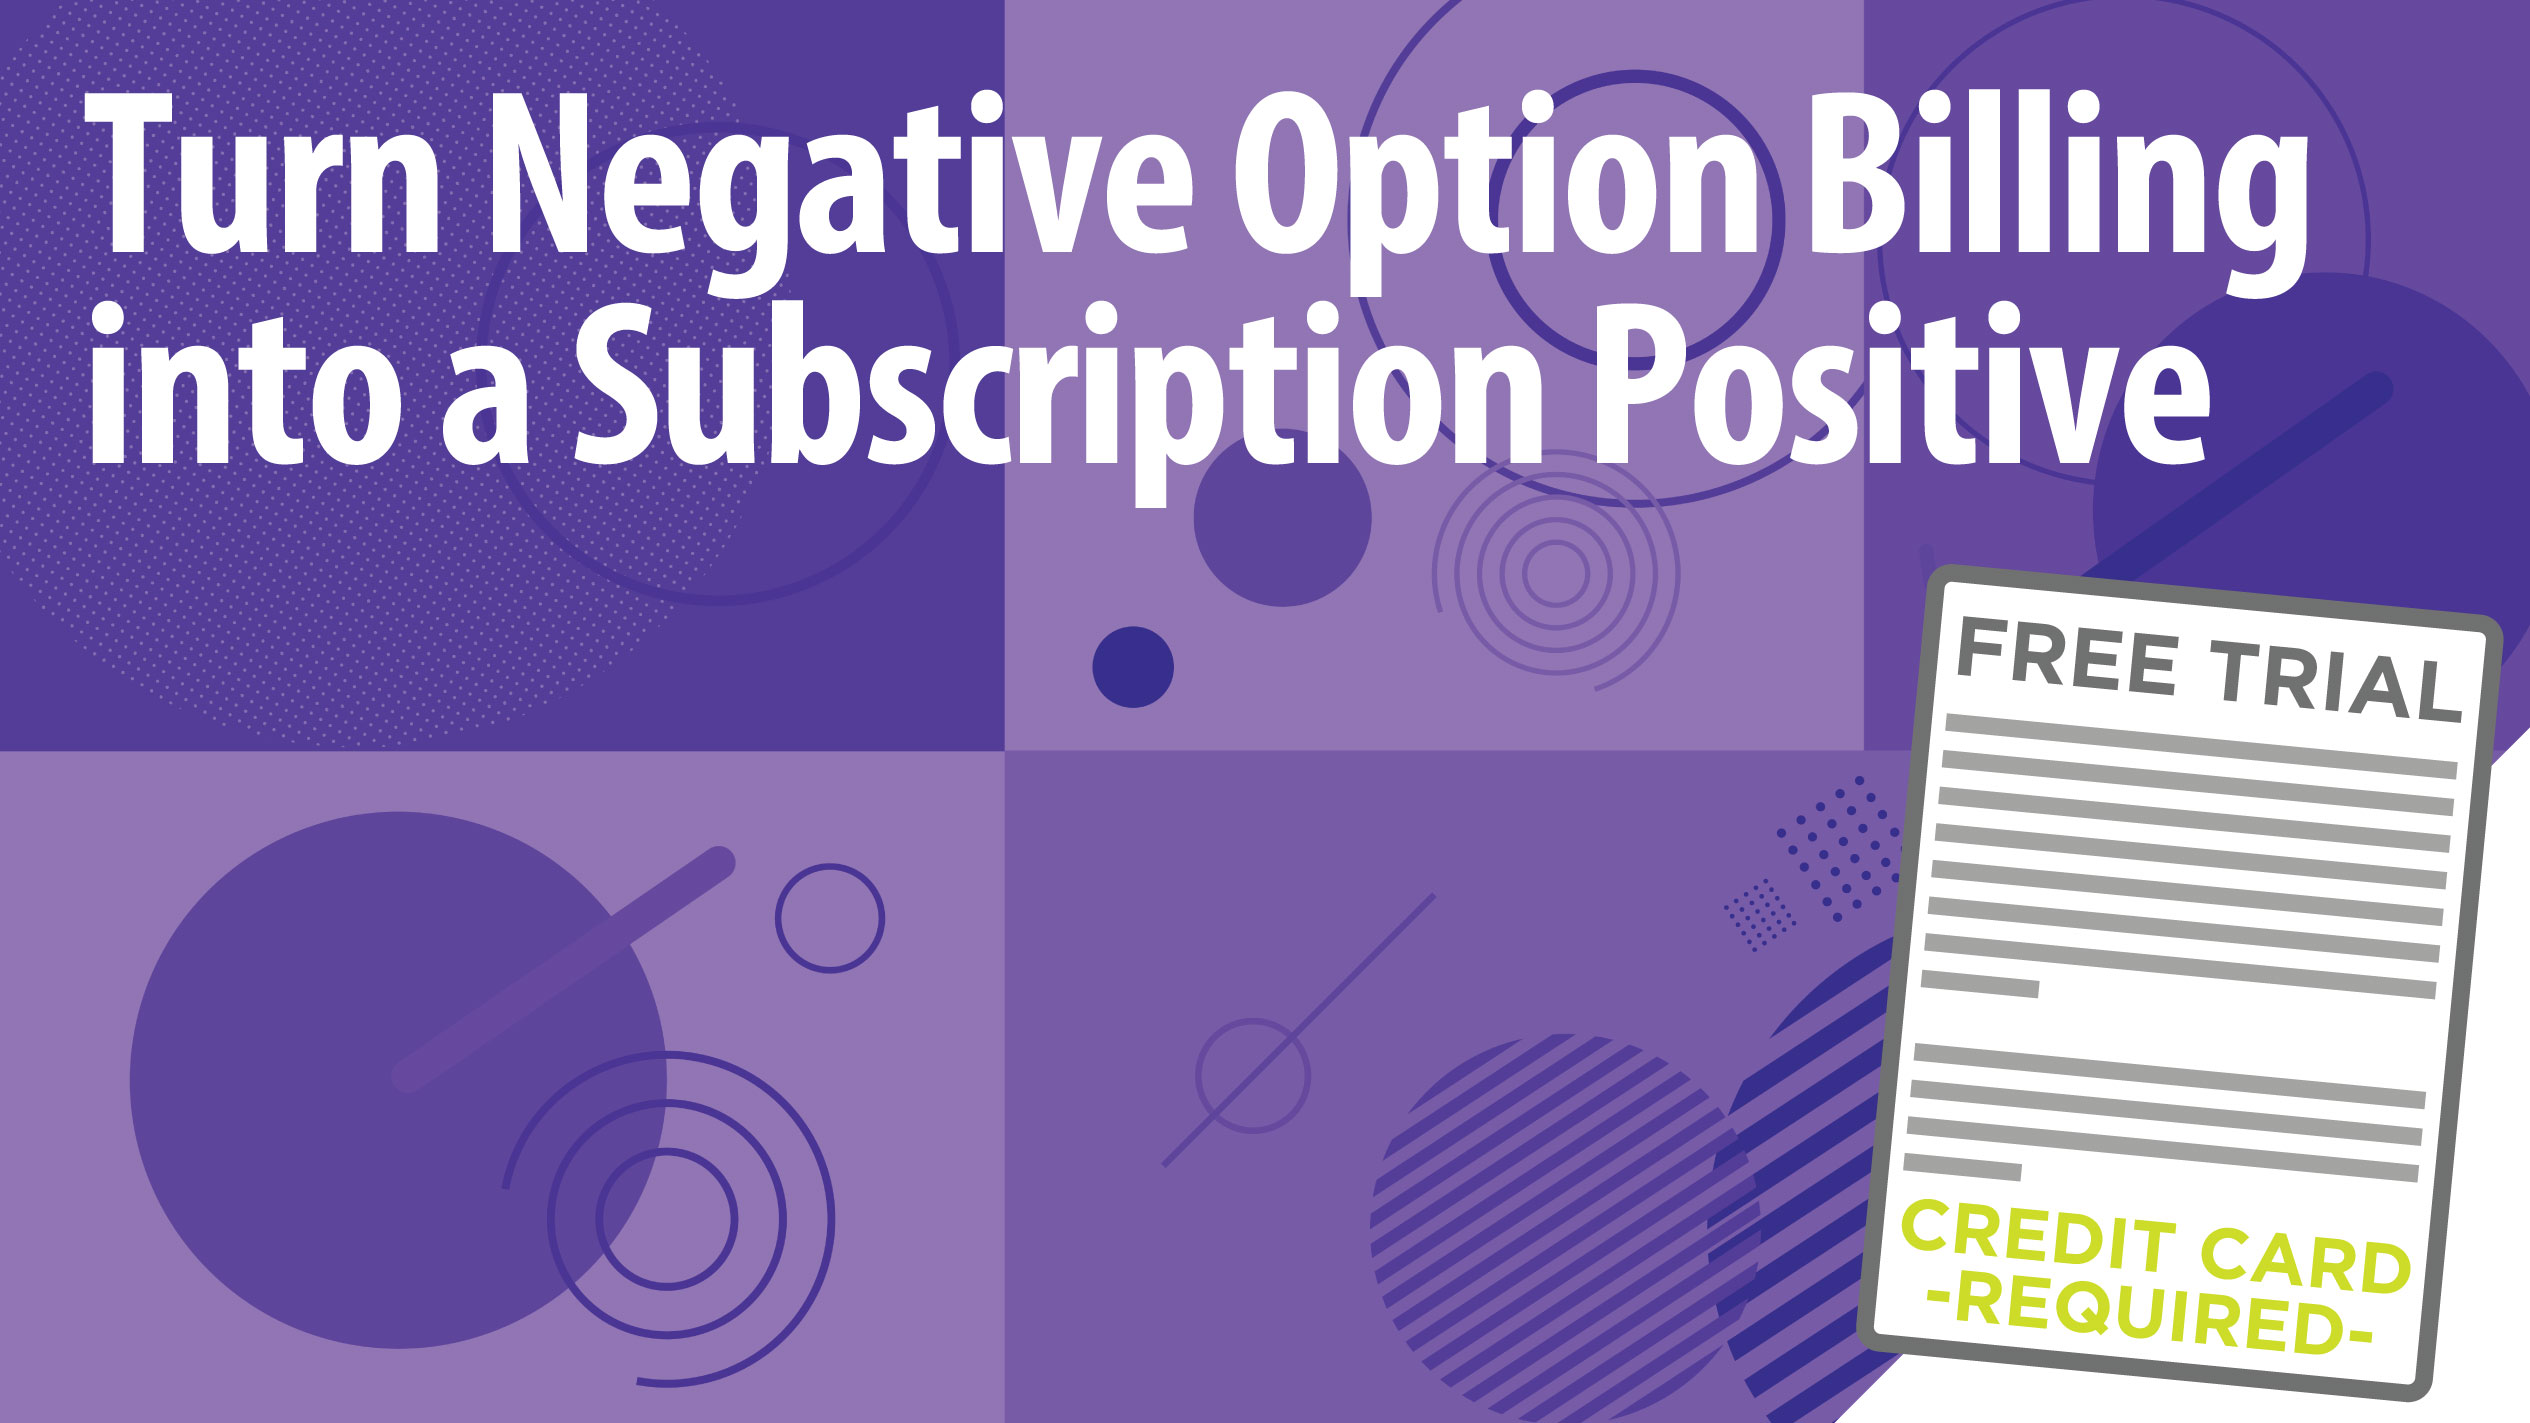 Turn Negative Option Billing into a Subscription Positive